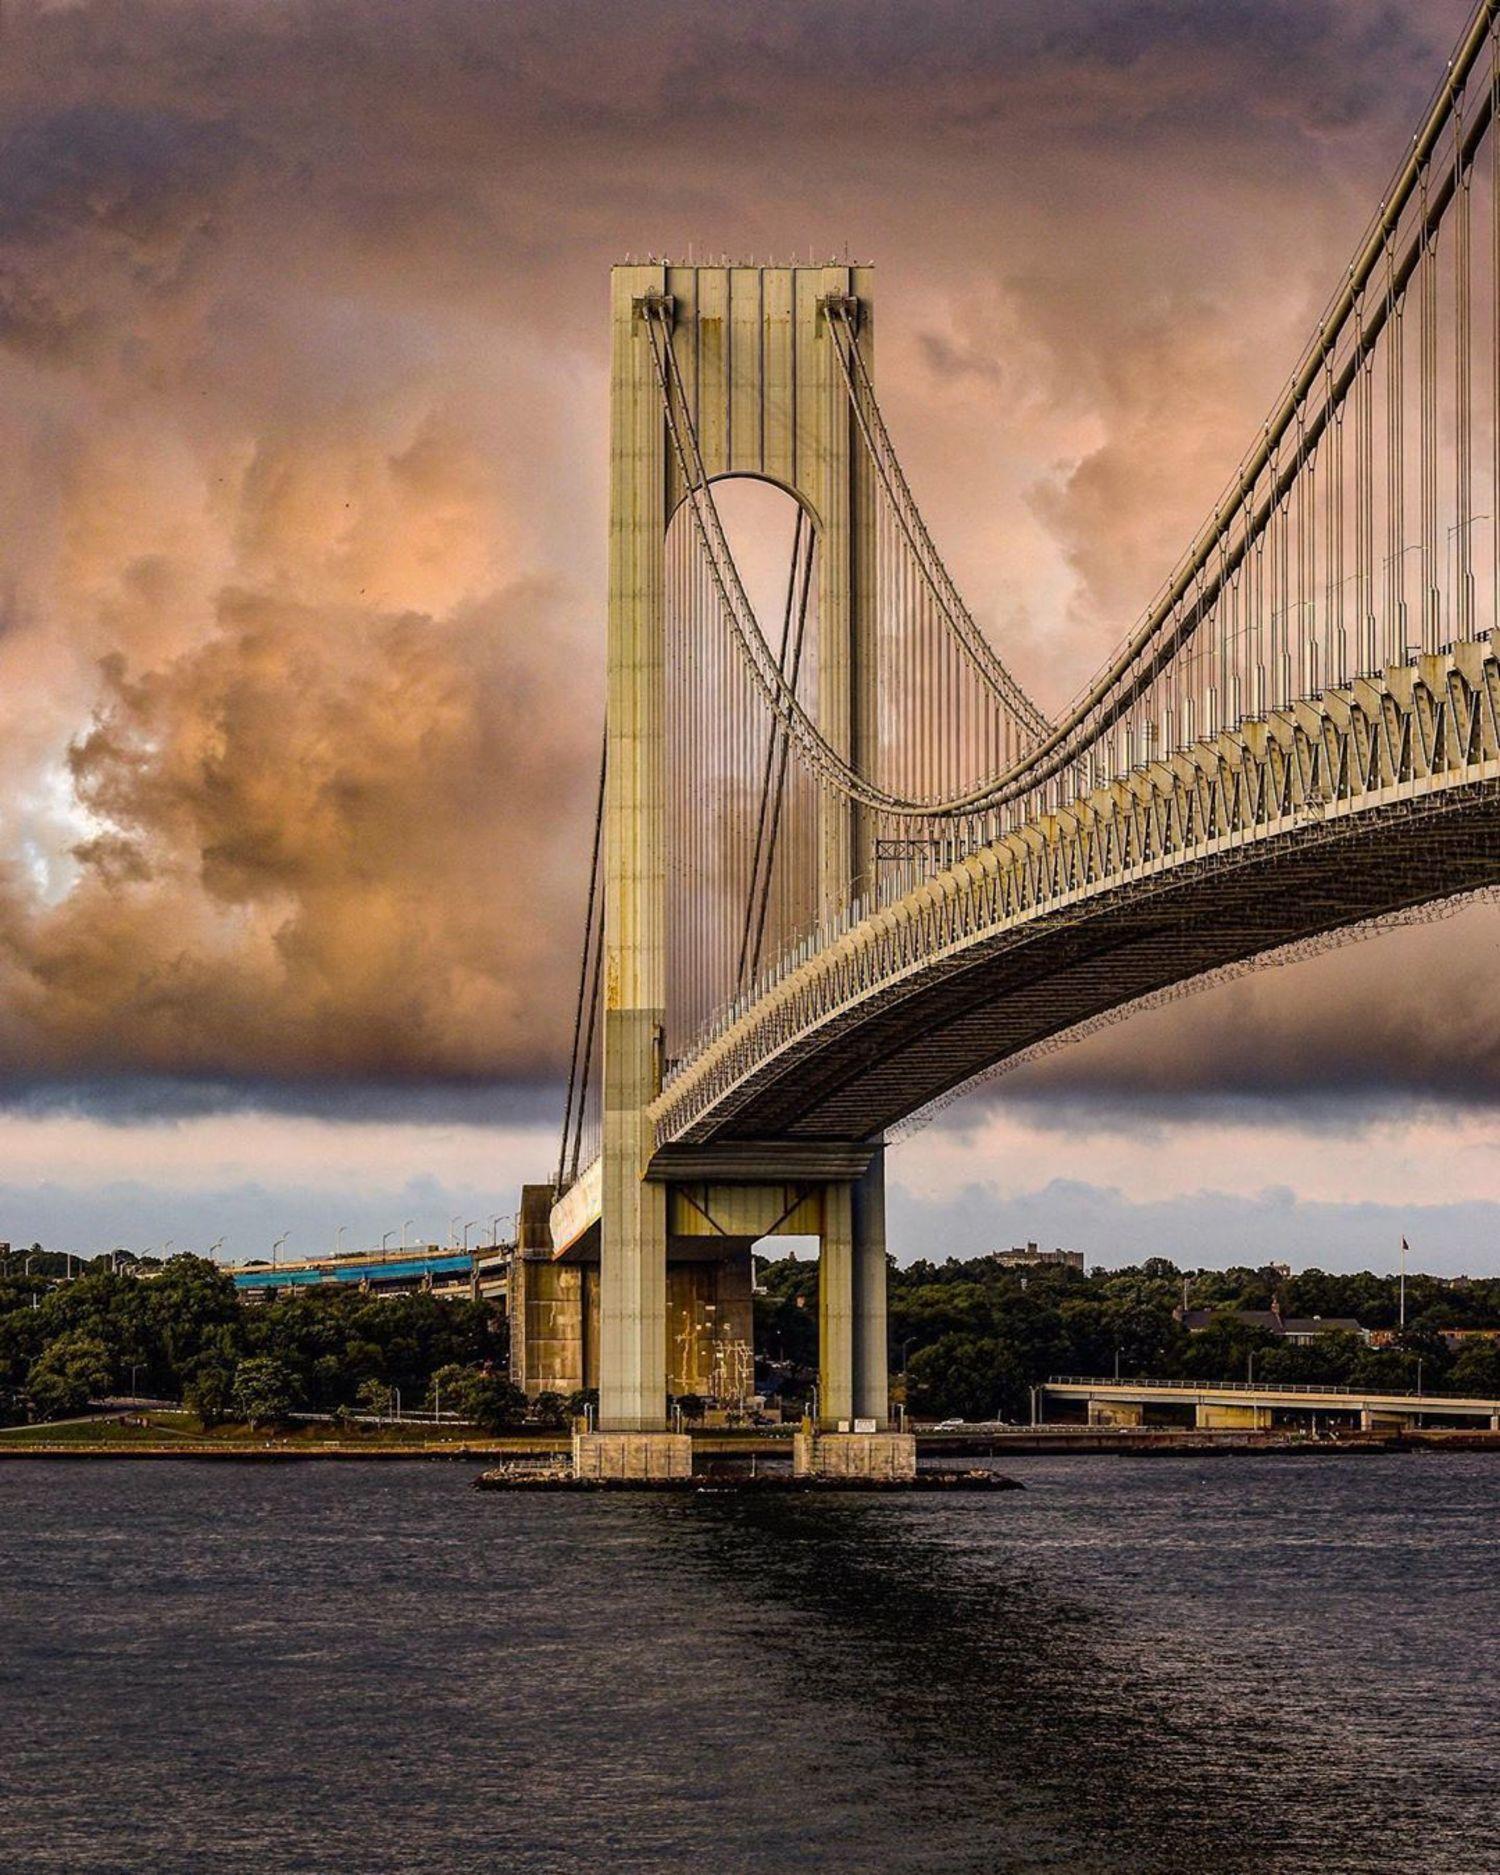 Verrazzano-Narrows Bridge, New York, New York